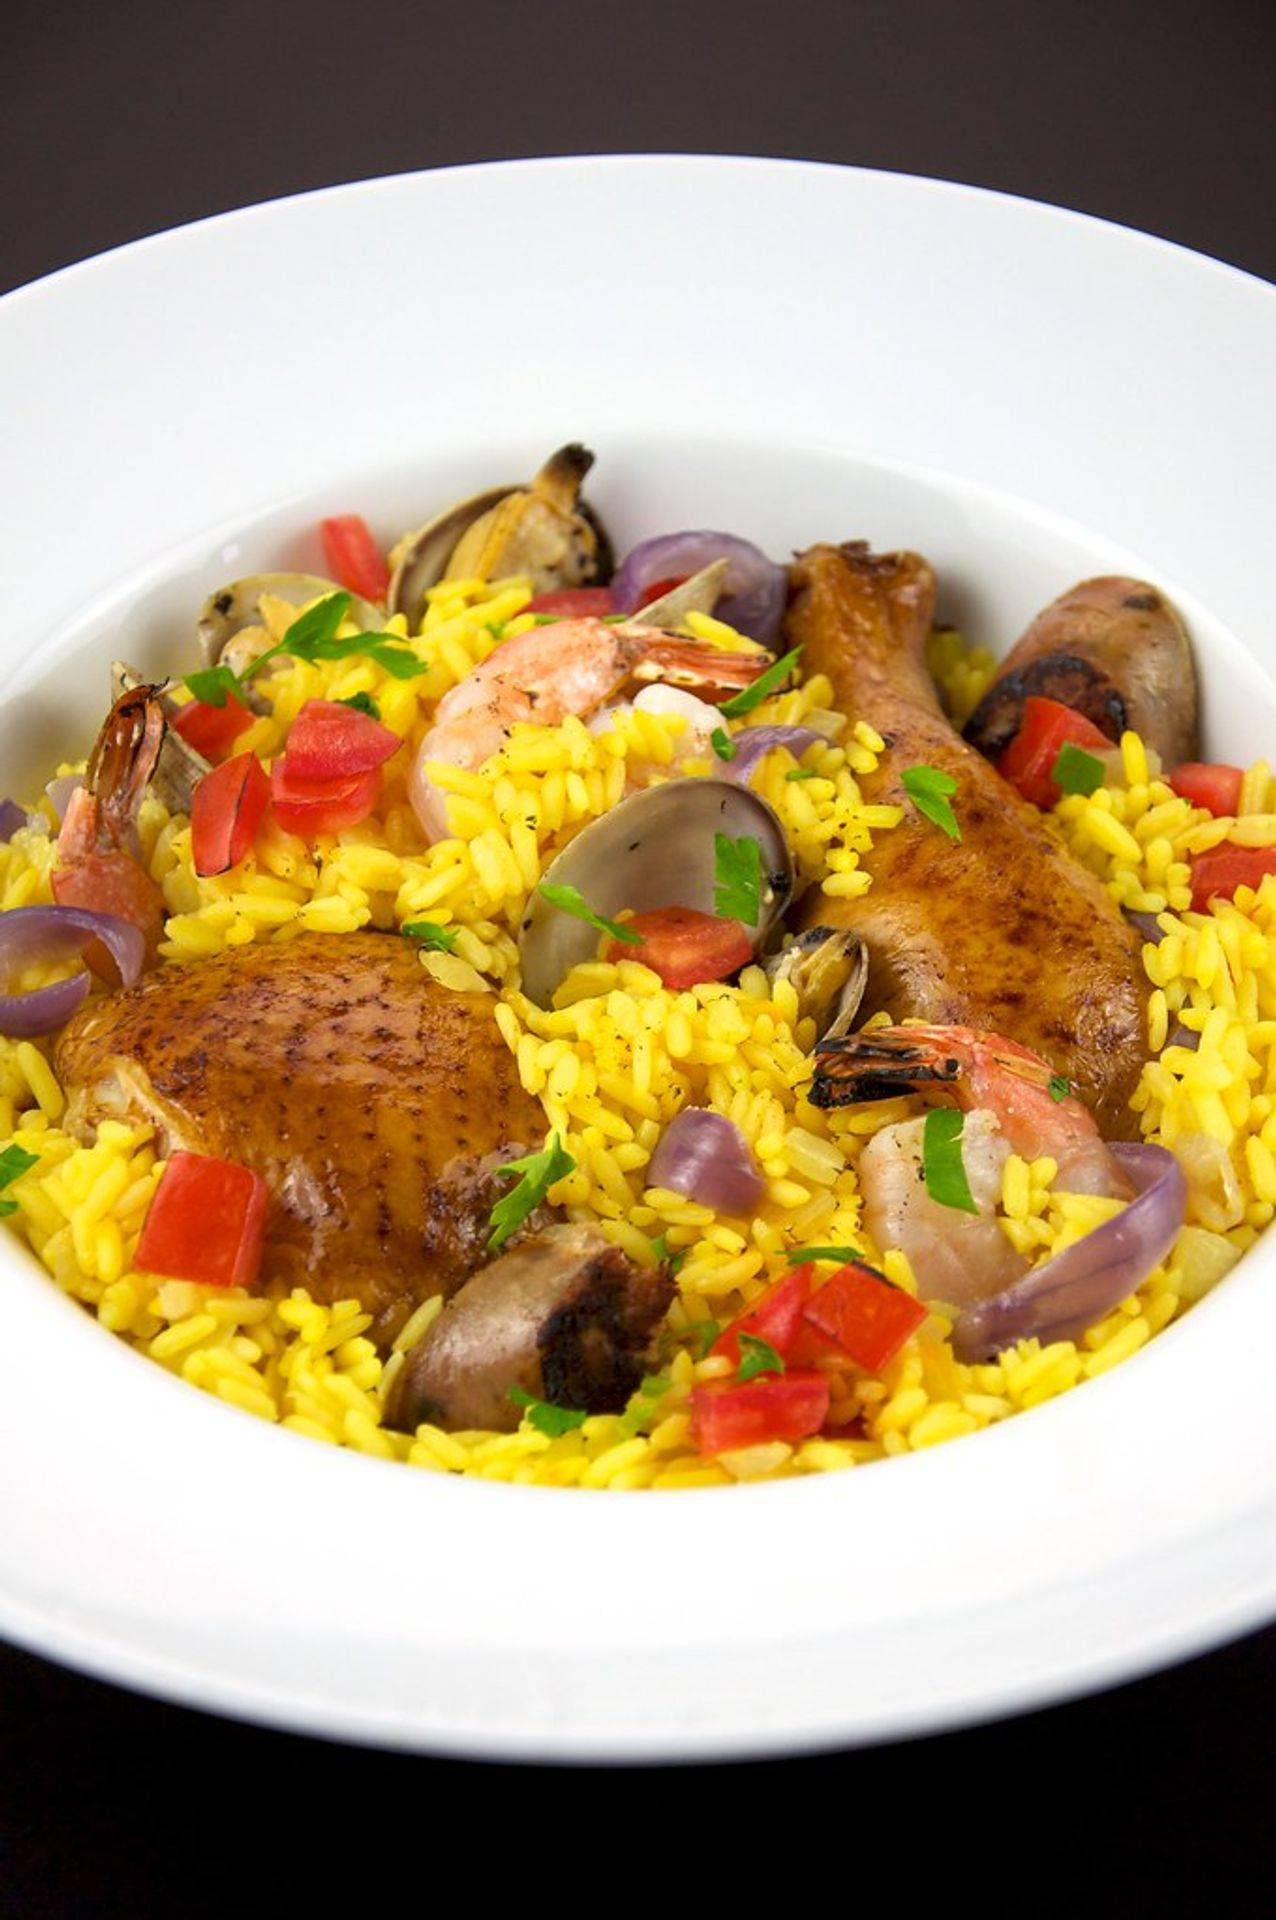 Paella Royale, poulet, lapin, gambas, langoustines, fruits de mer